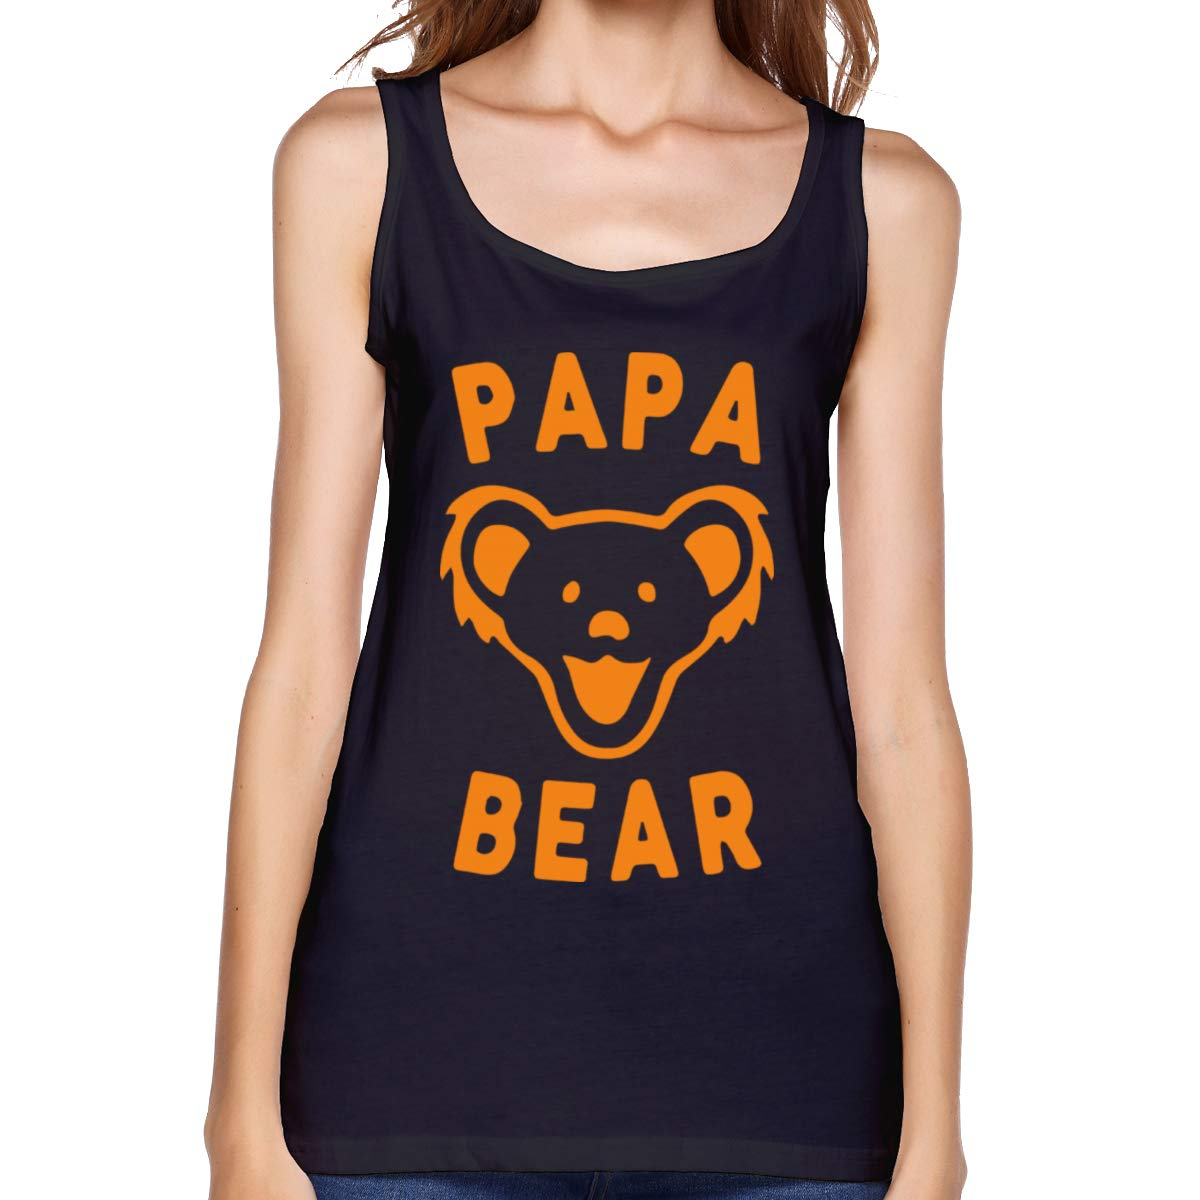 Viihahn Papa Bear Design Funny Sports Sleeveless Tank Top Shirt